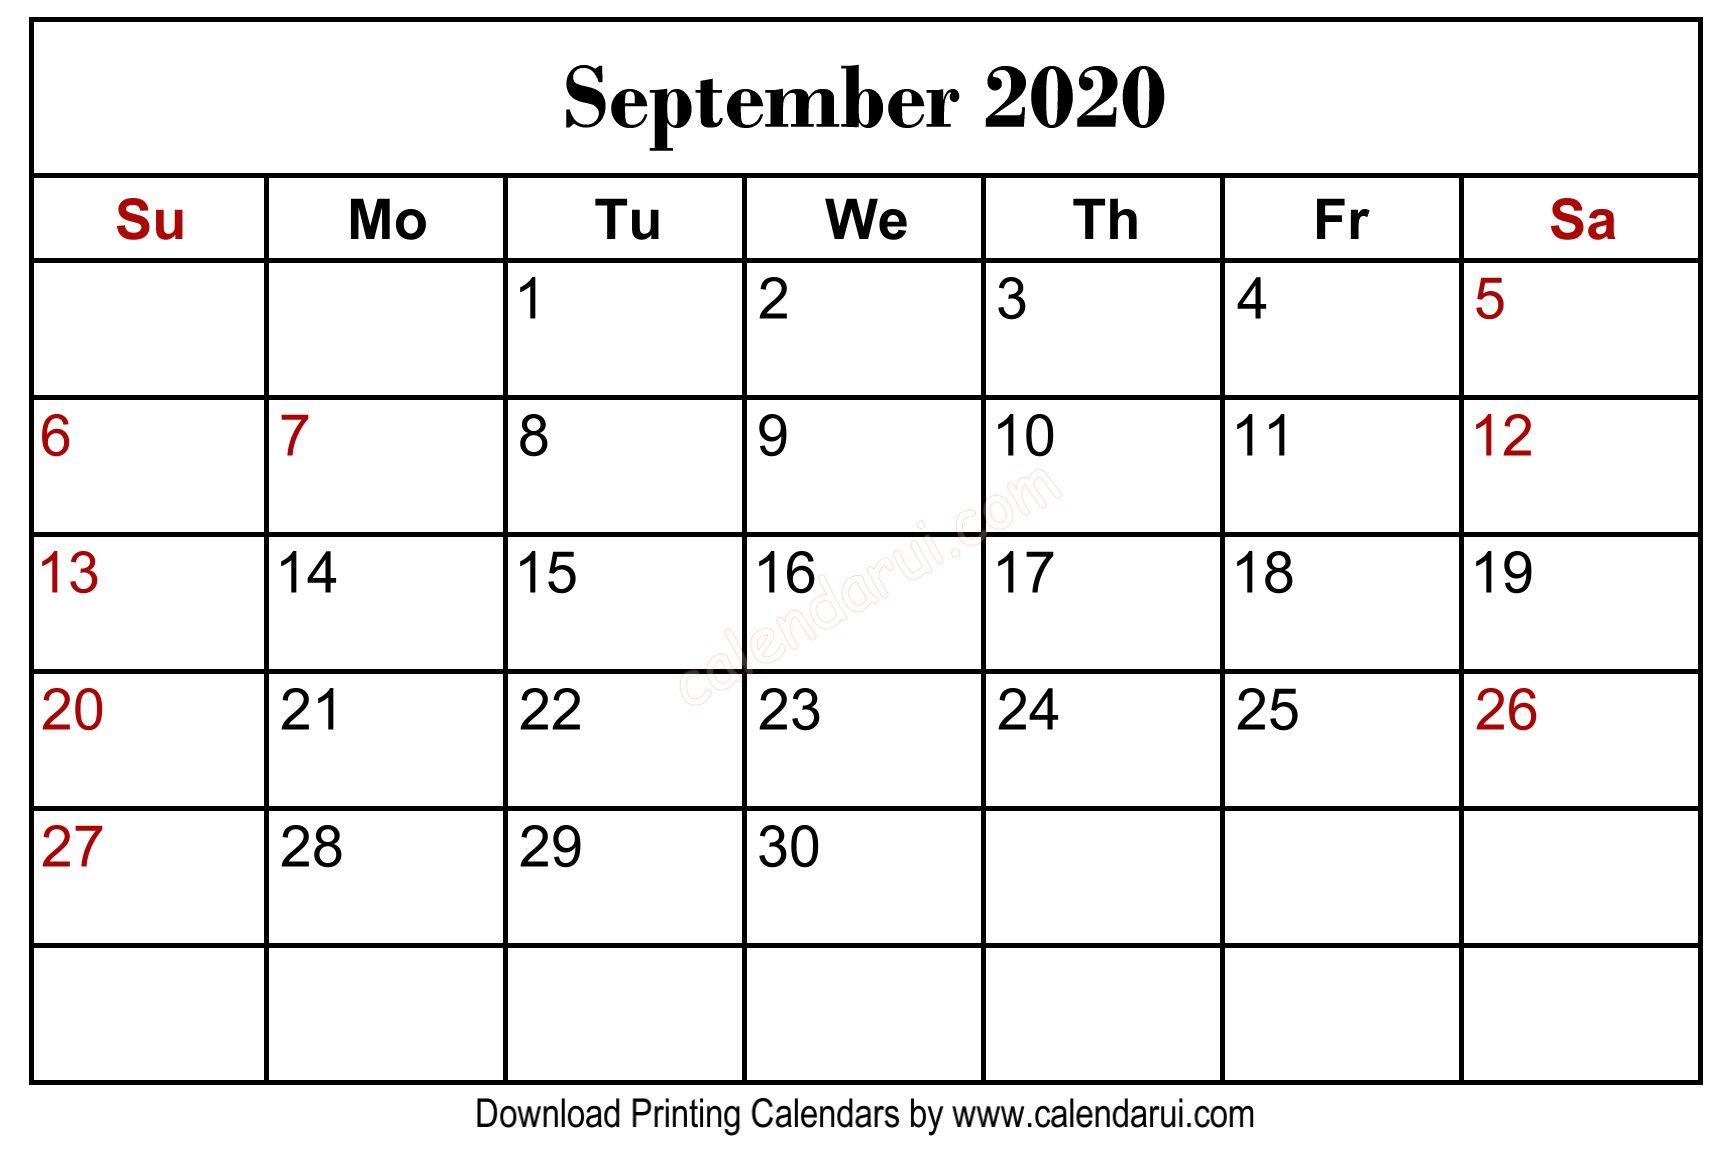 September 2020 Blank Calendar Printable Free Download Blank